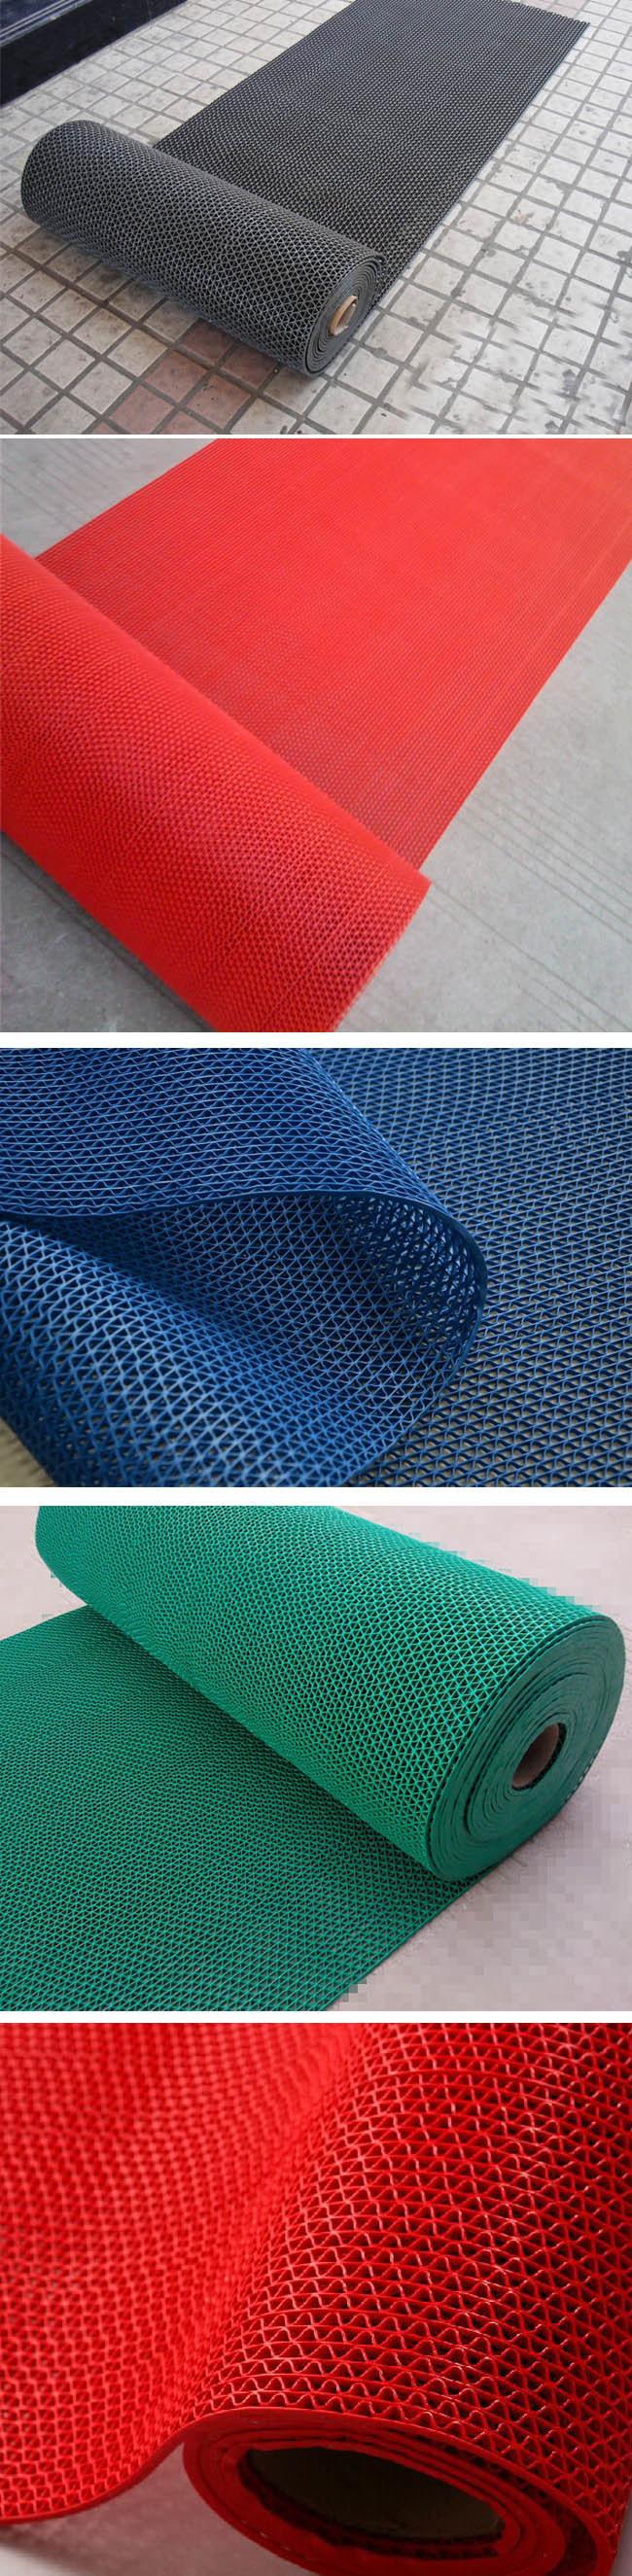 China Indoor Outdoor Anti Slip Non Skid Slippery Resistant